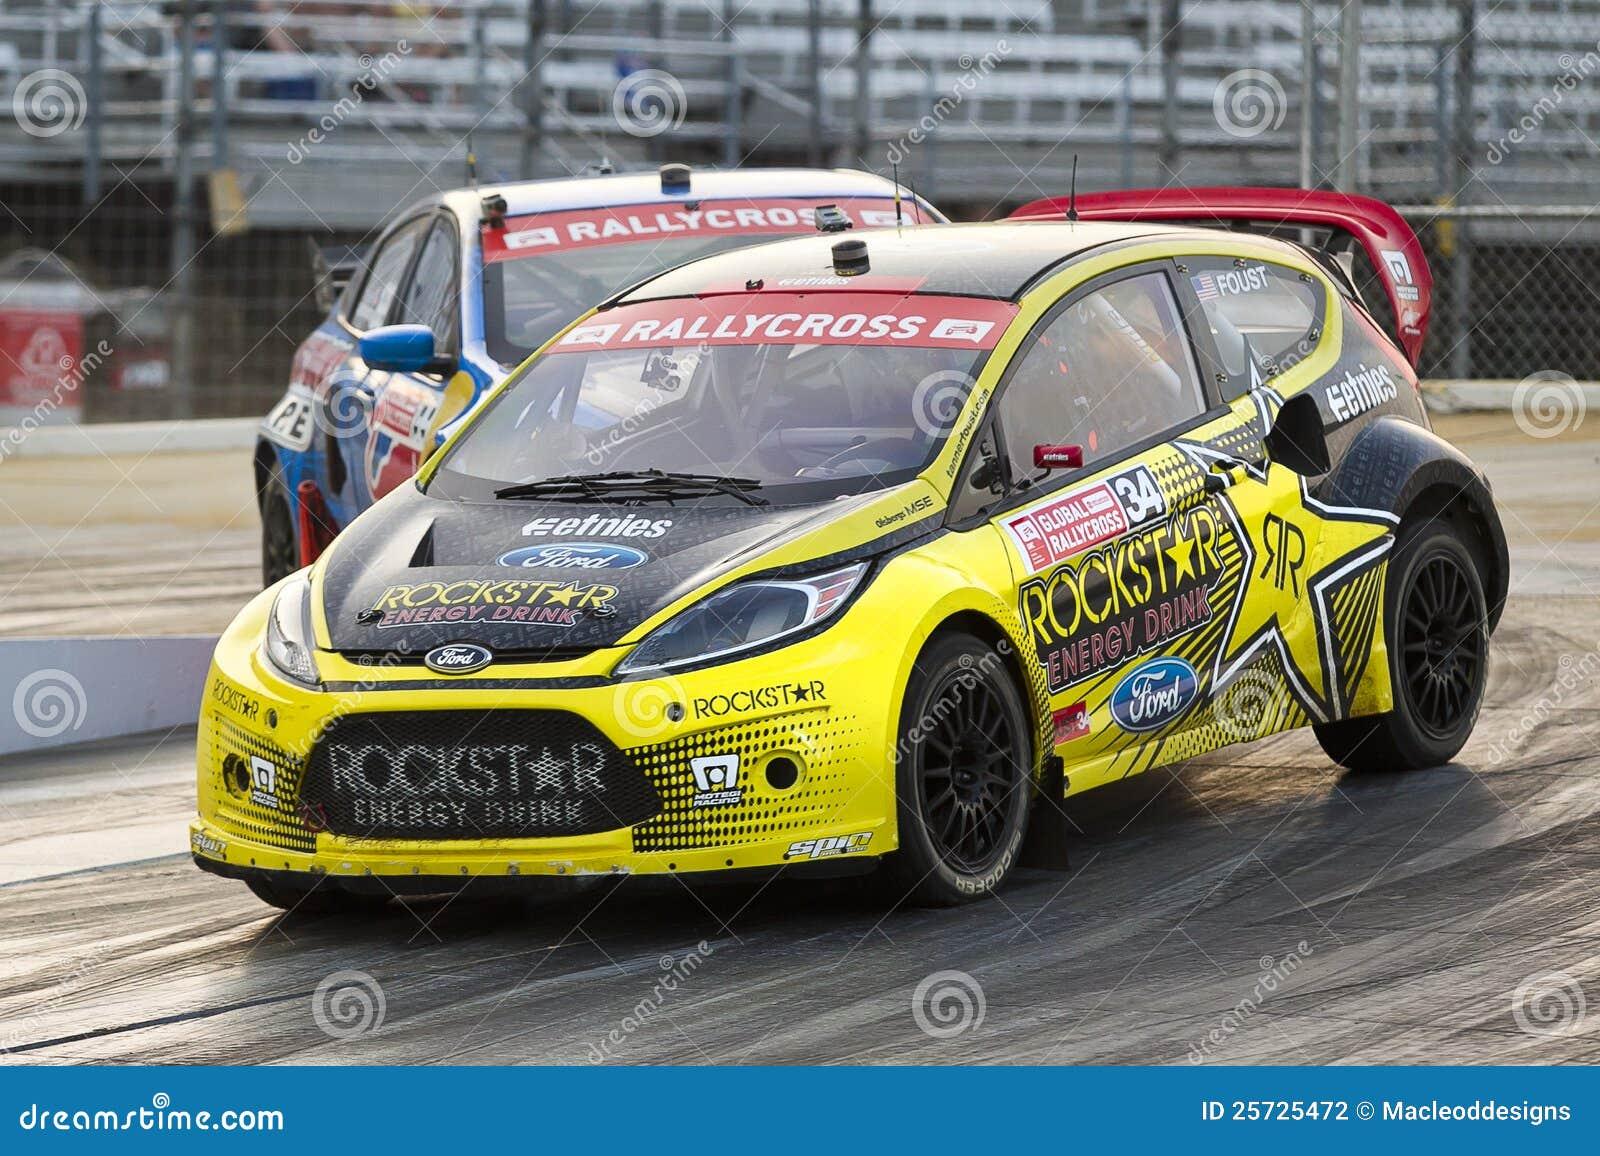 NASCAR: Jul 14 Global Rallycross Championship